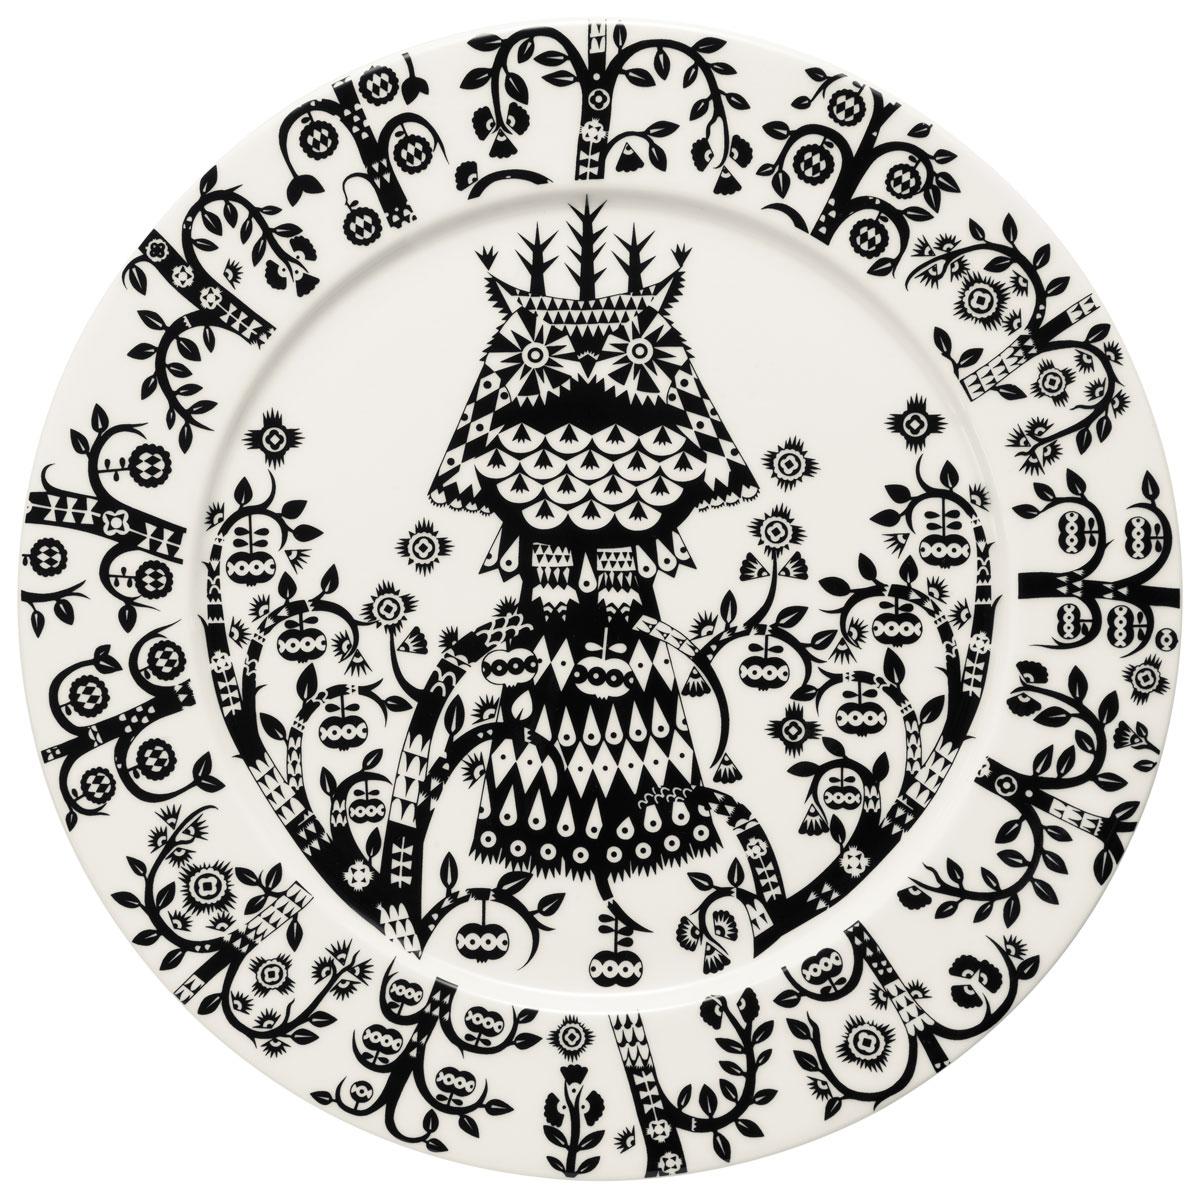 Тарелка Iittala Taika, цвет: черный, диаметр 27 см1011639